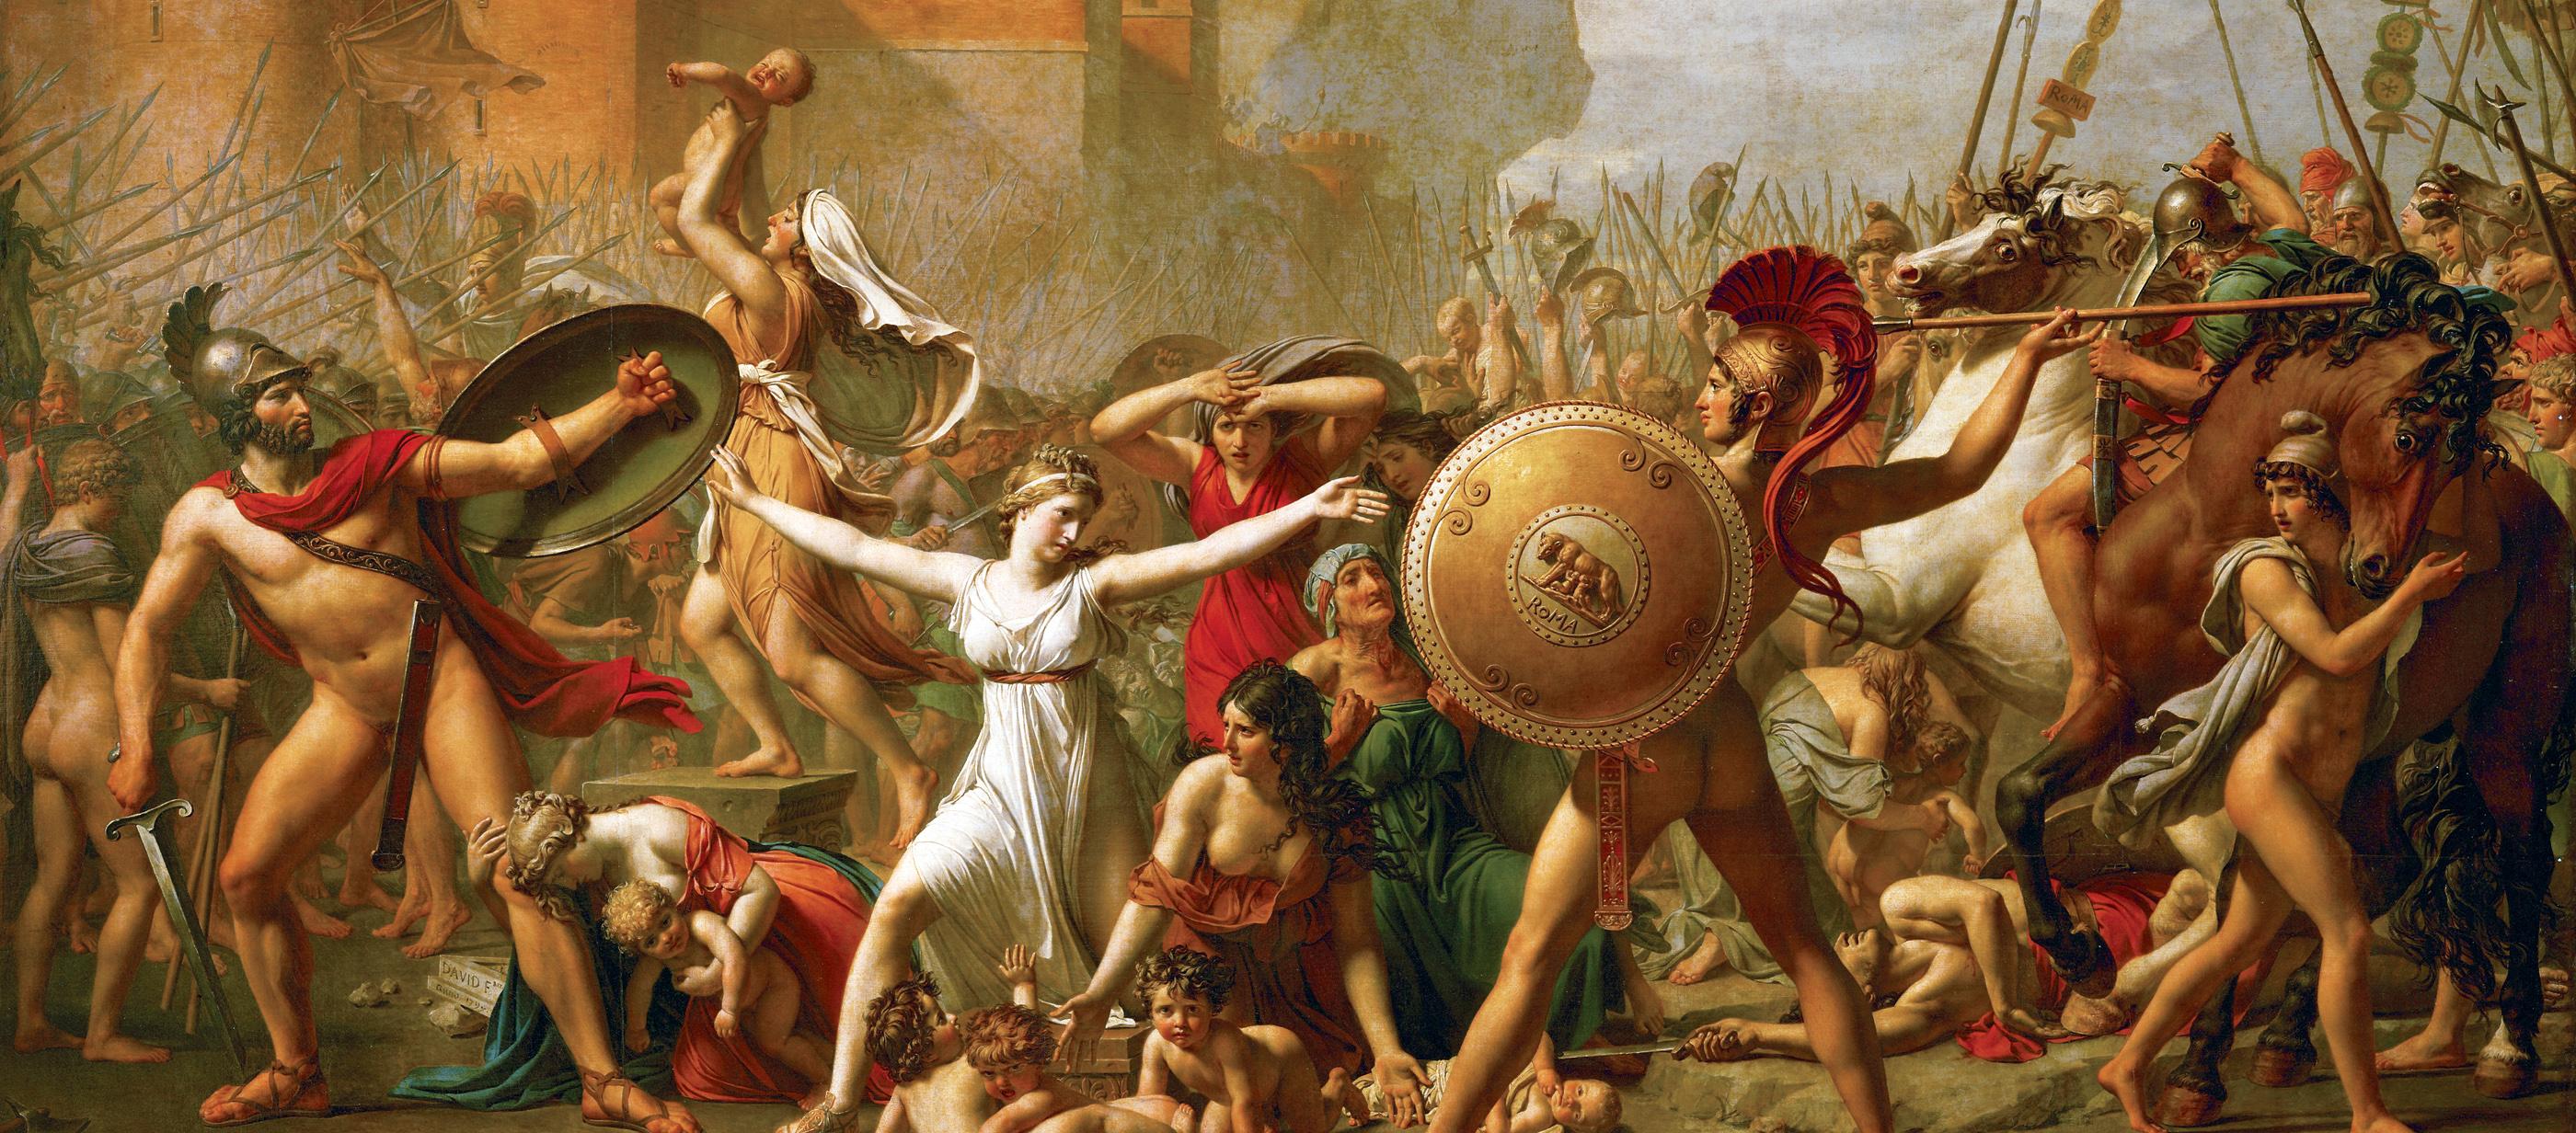 The Rape of the Sabine Women - Wikipedia